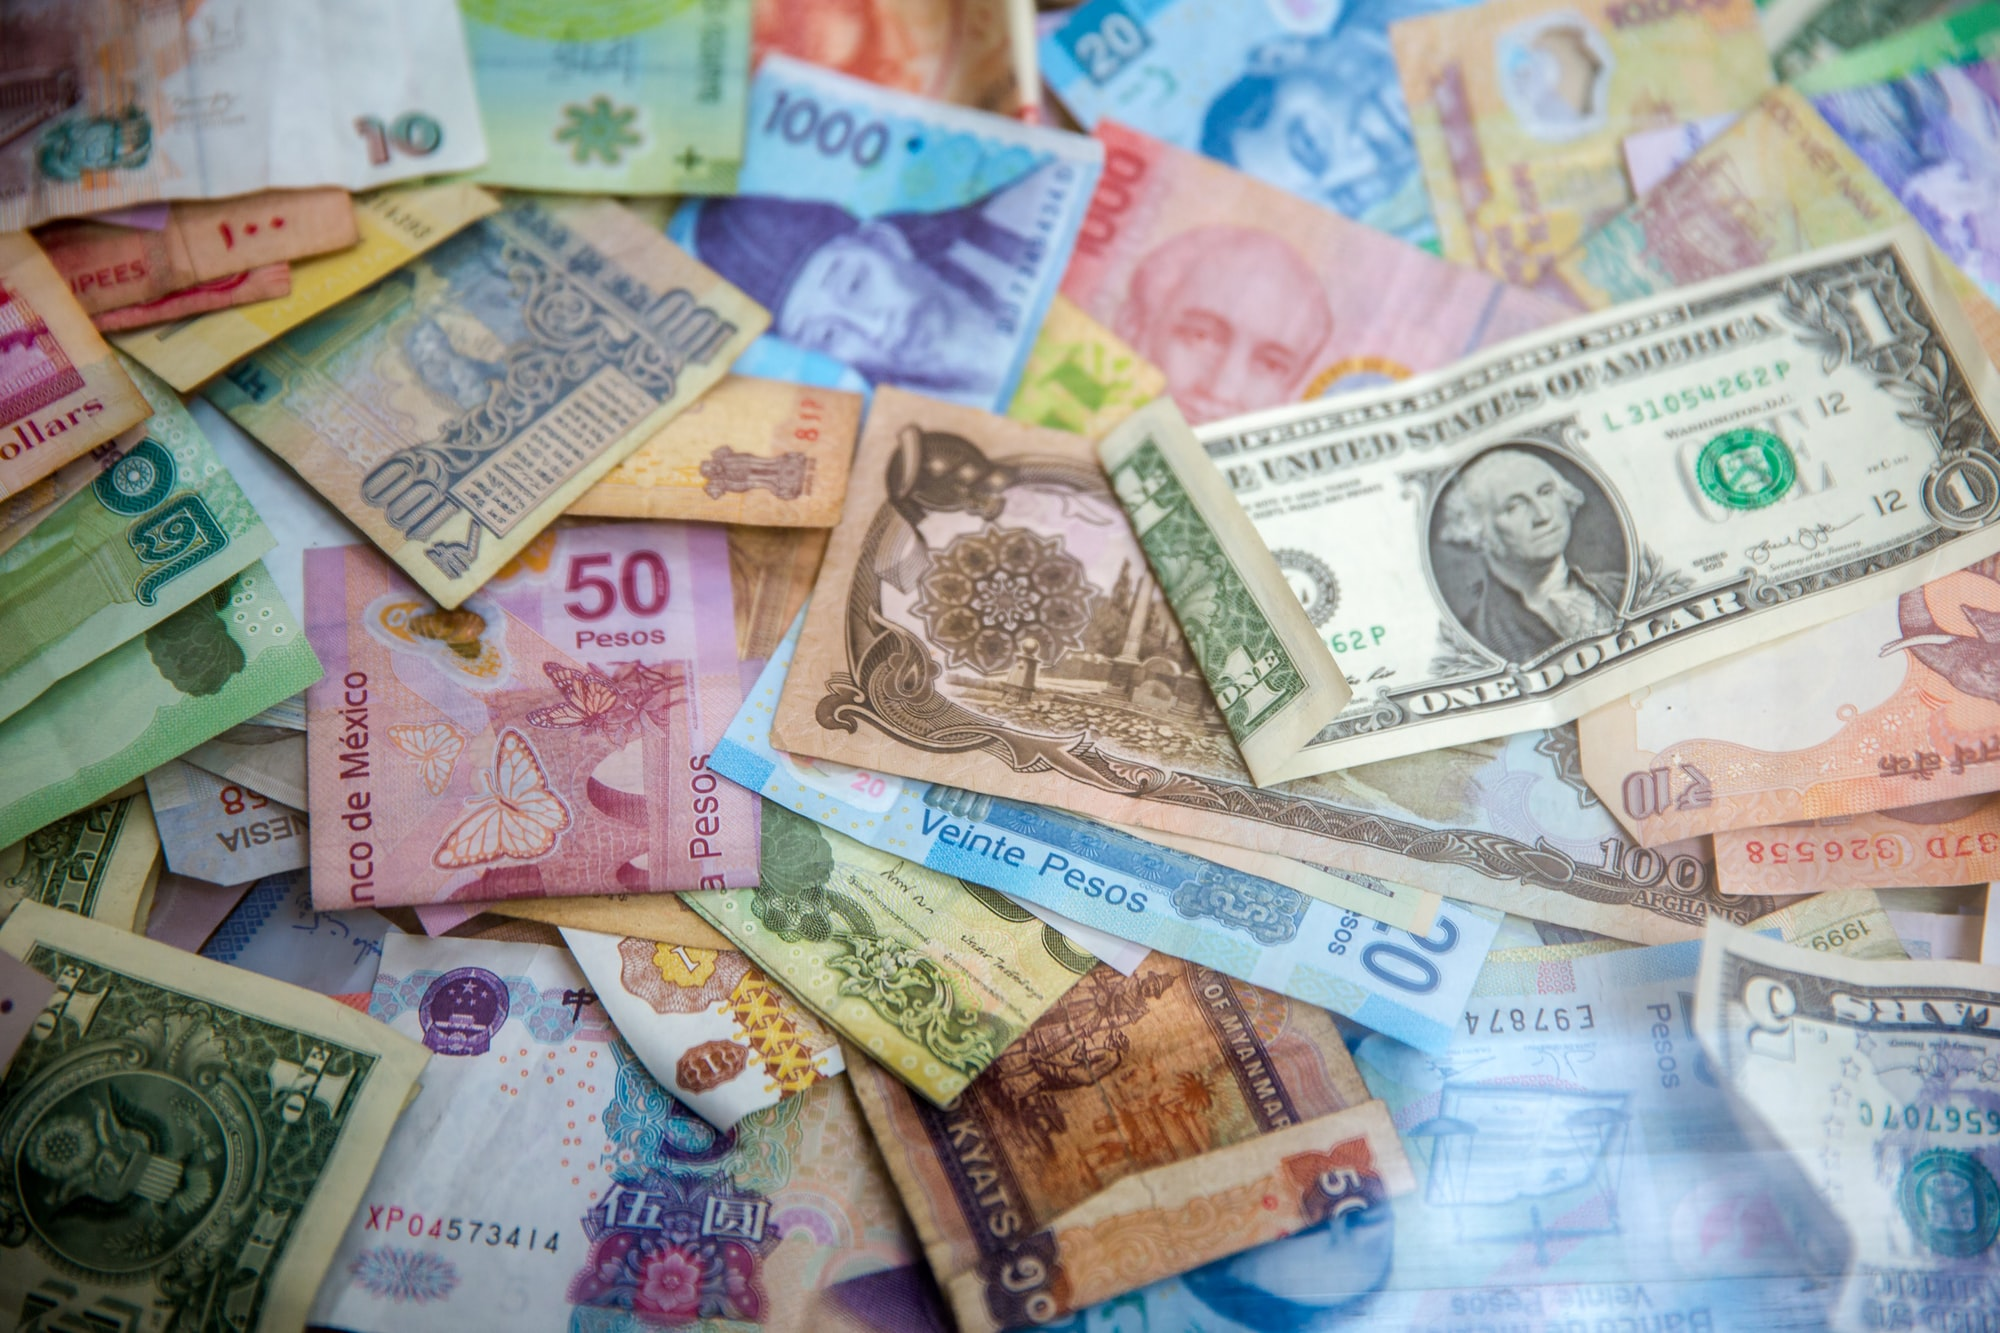 27: Money and debt